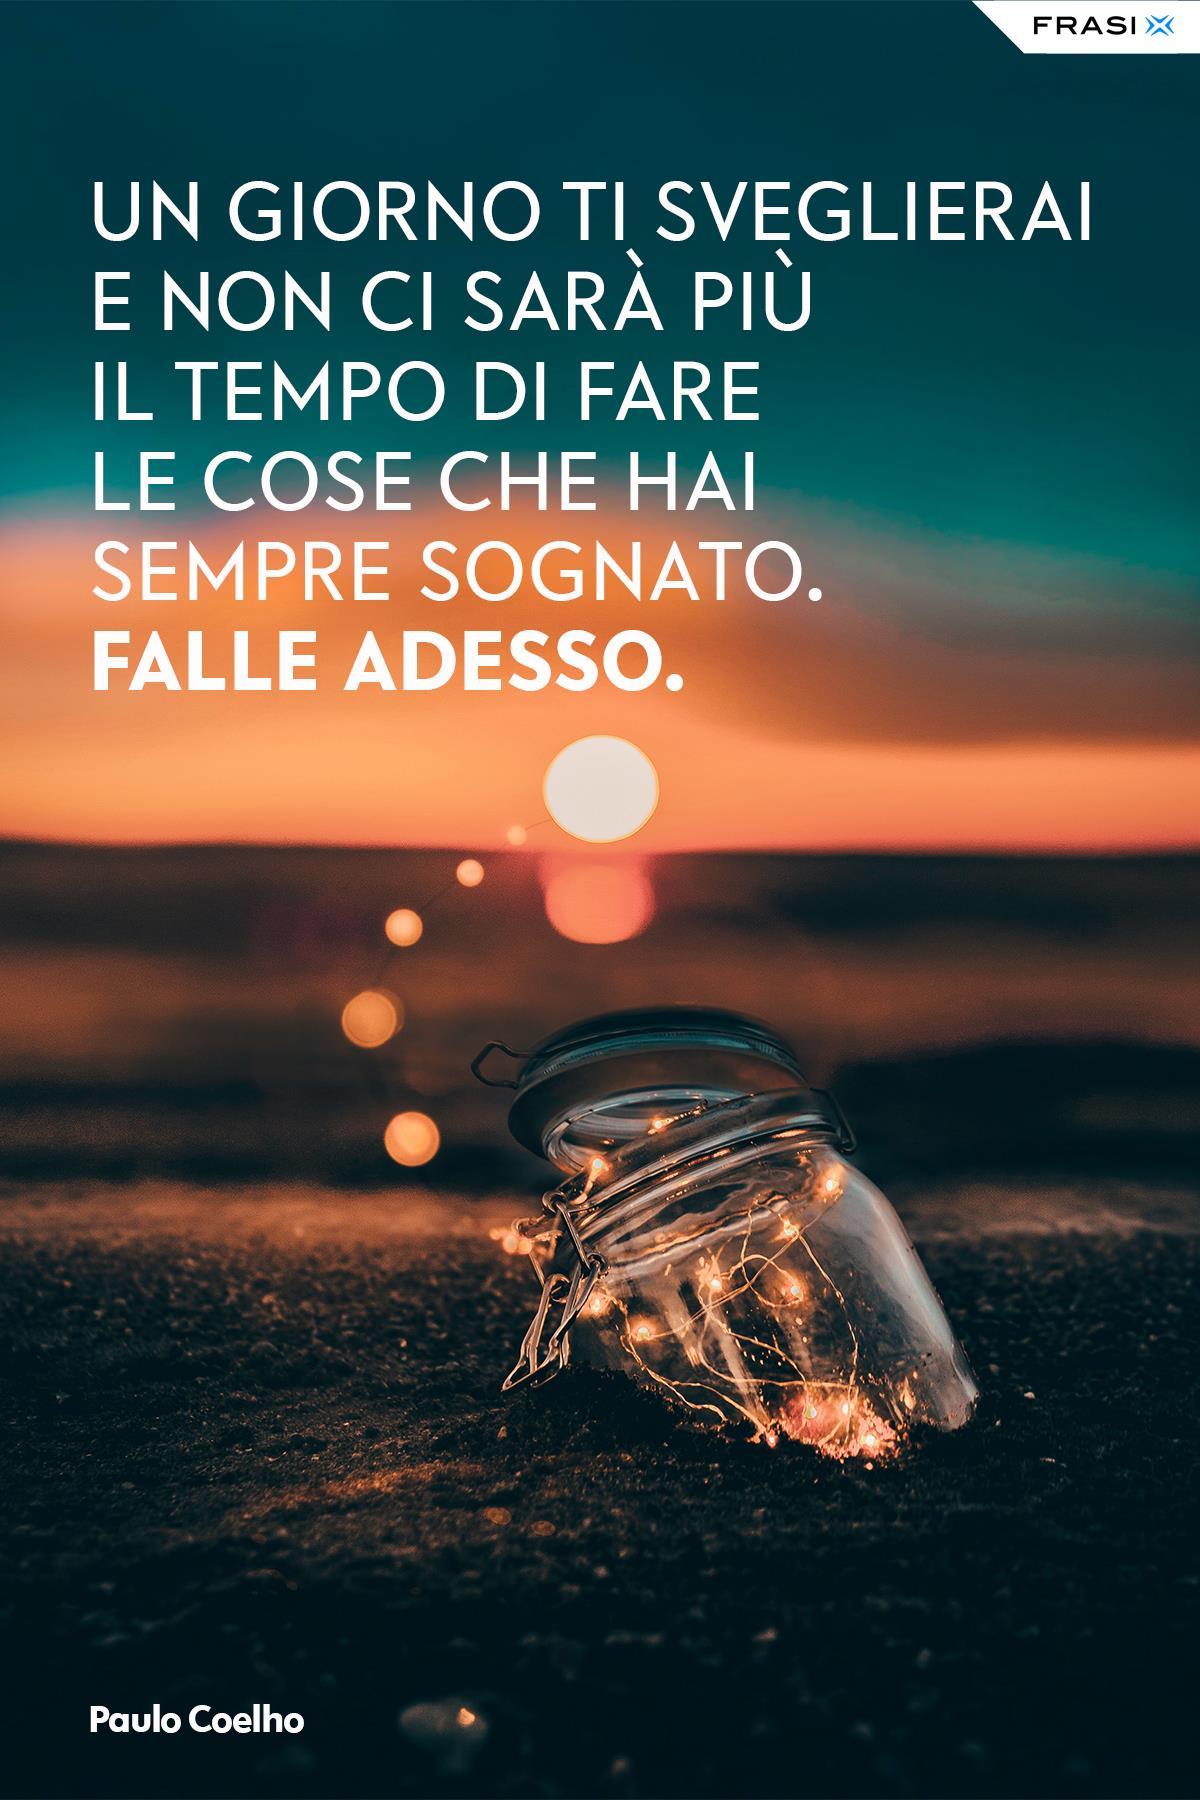 Frasi sul tempo che passa Paulo Coelho